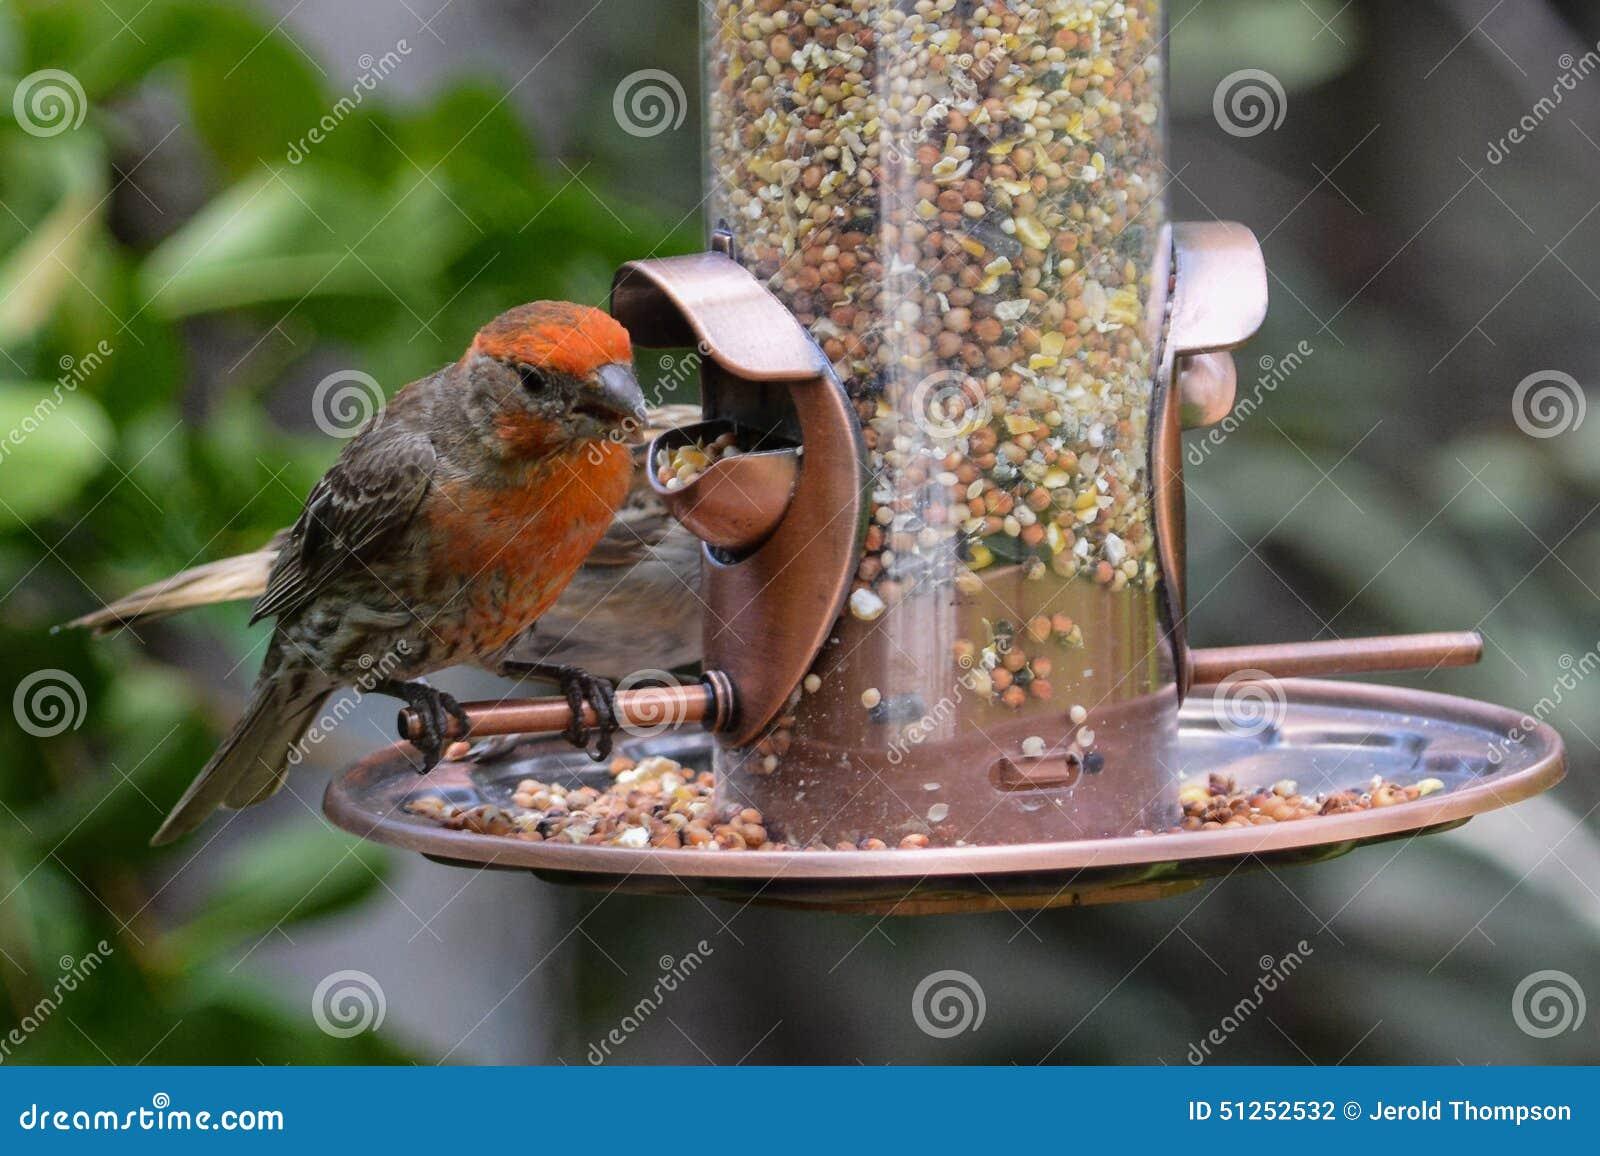 Backyard Bird Feeder - Backyard Bird Feeder Stock Photo. Image Of House, Male - 51252532